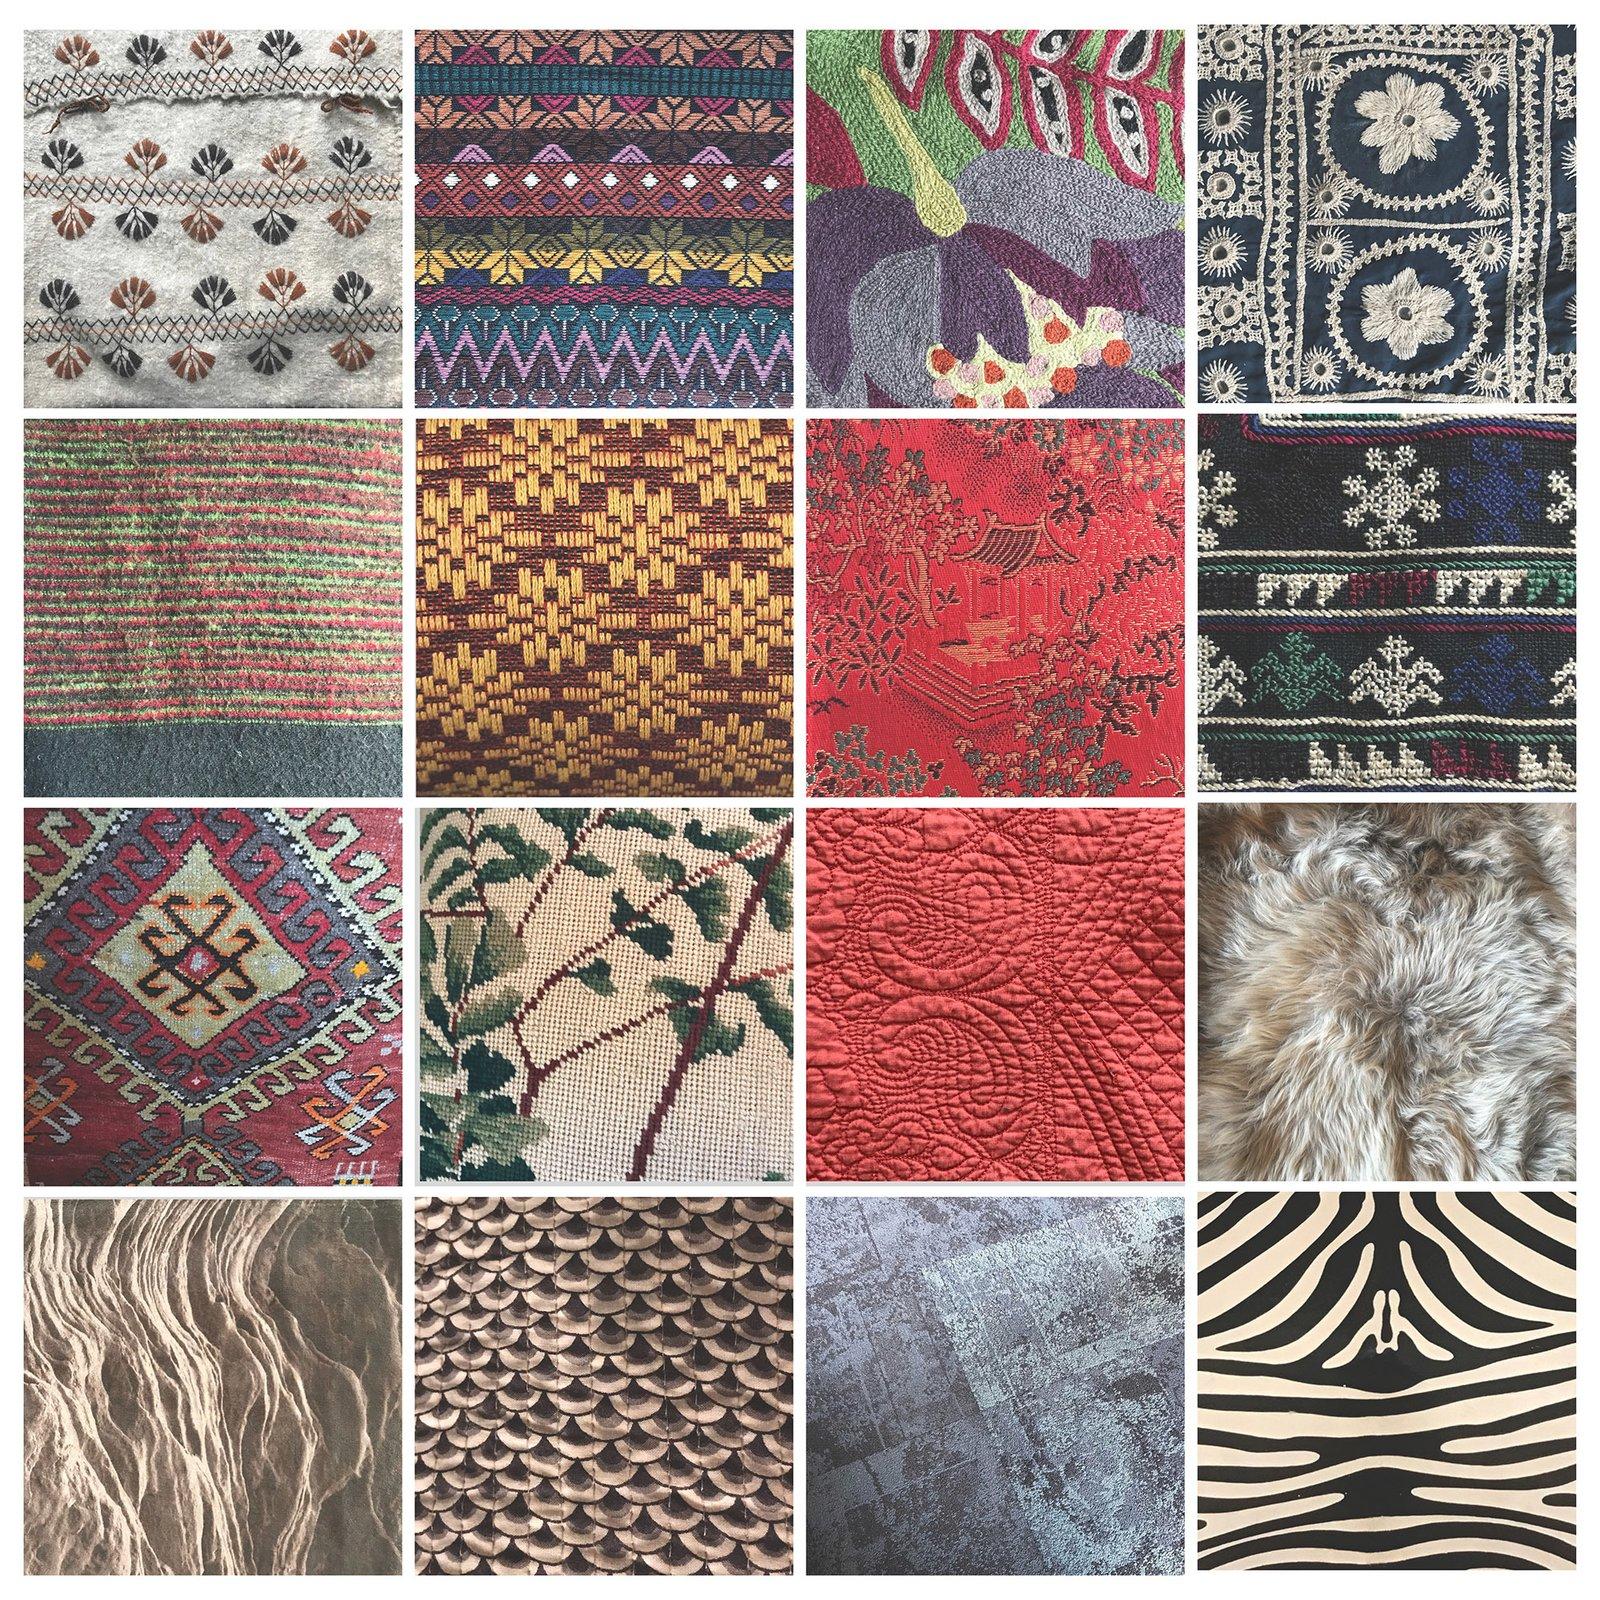 Biophilic textiles